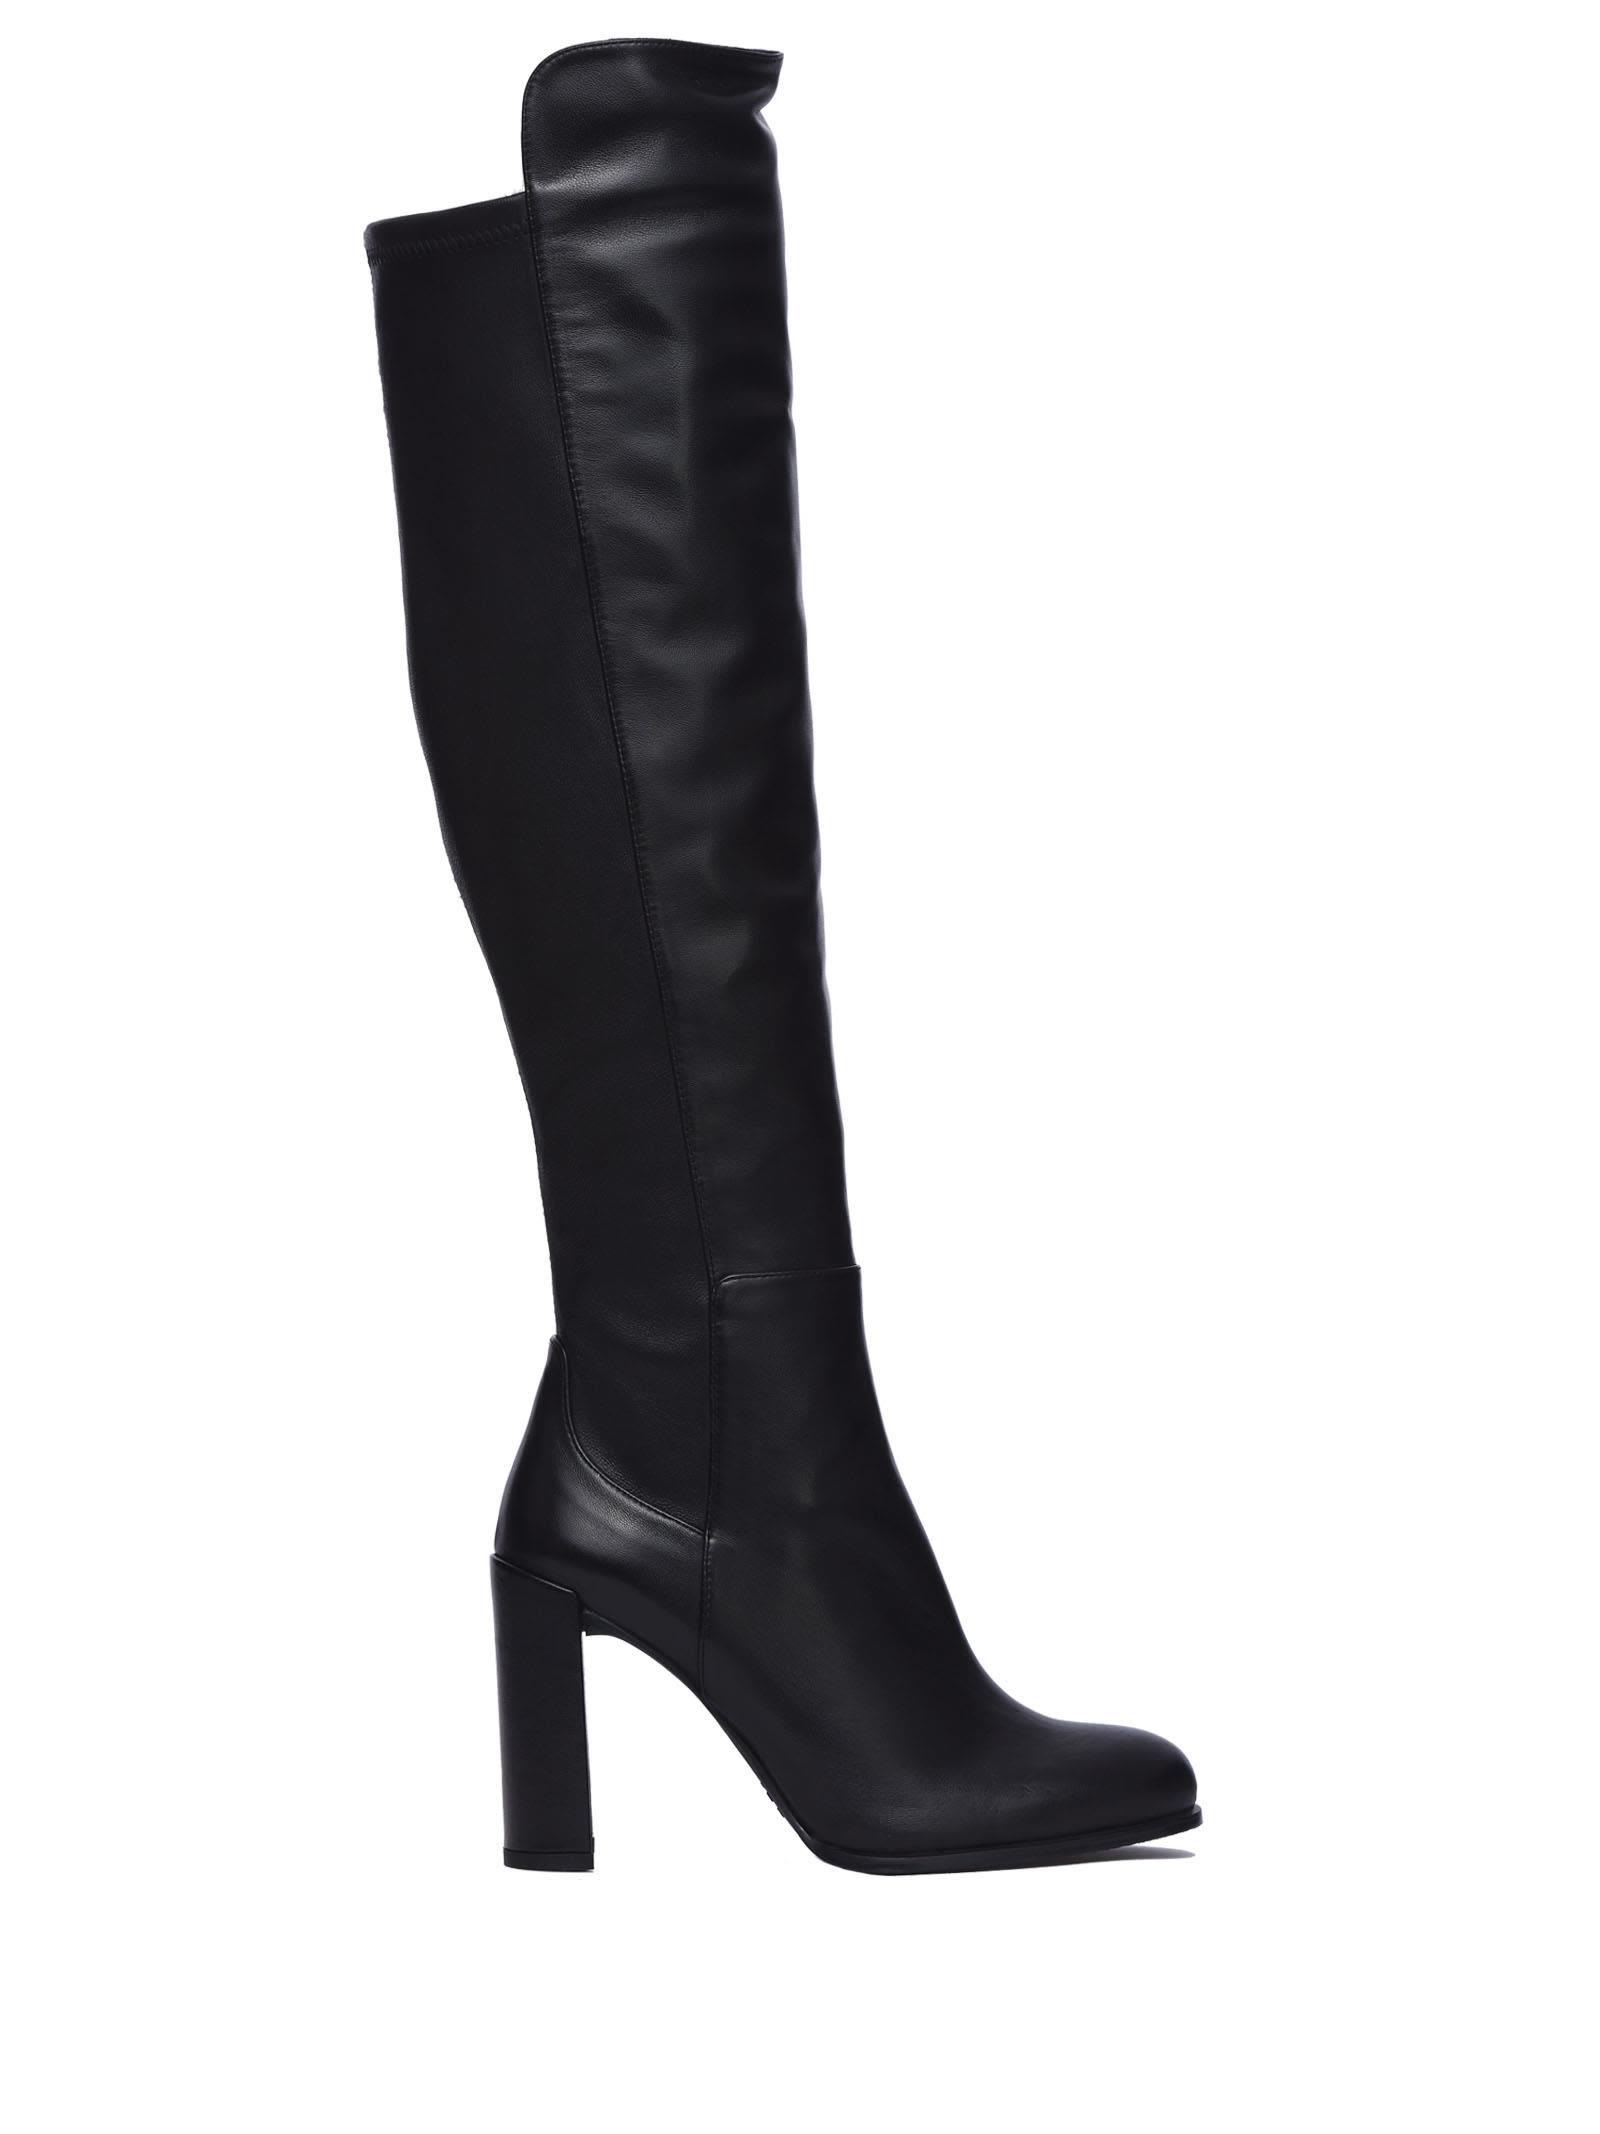 Stuart Weitzman Alljill Boots